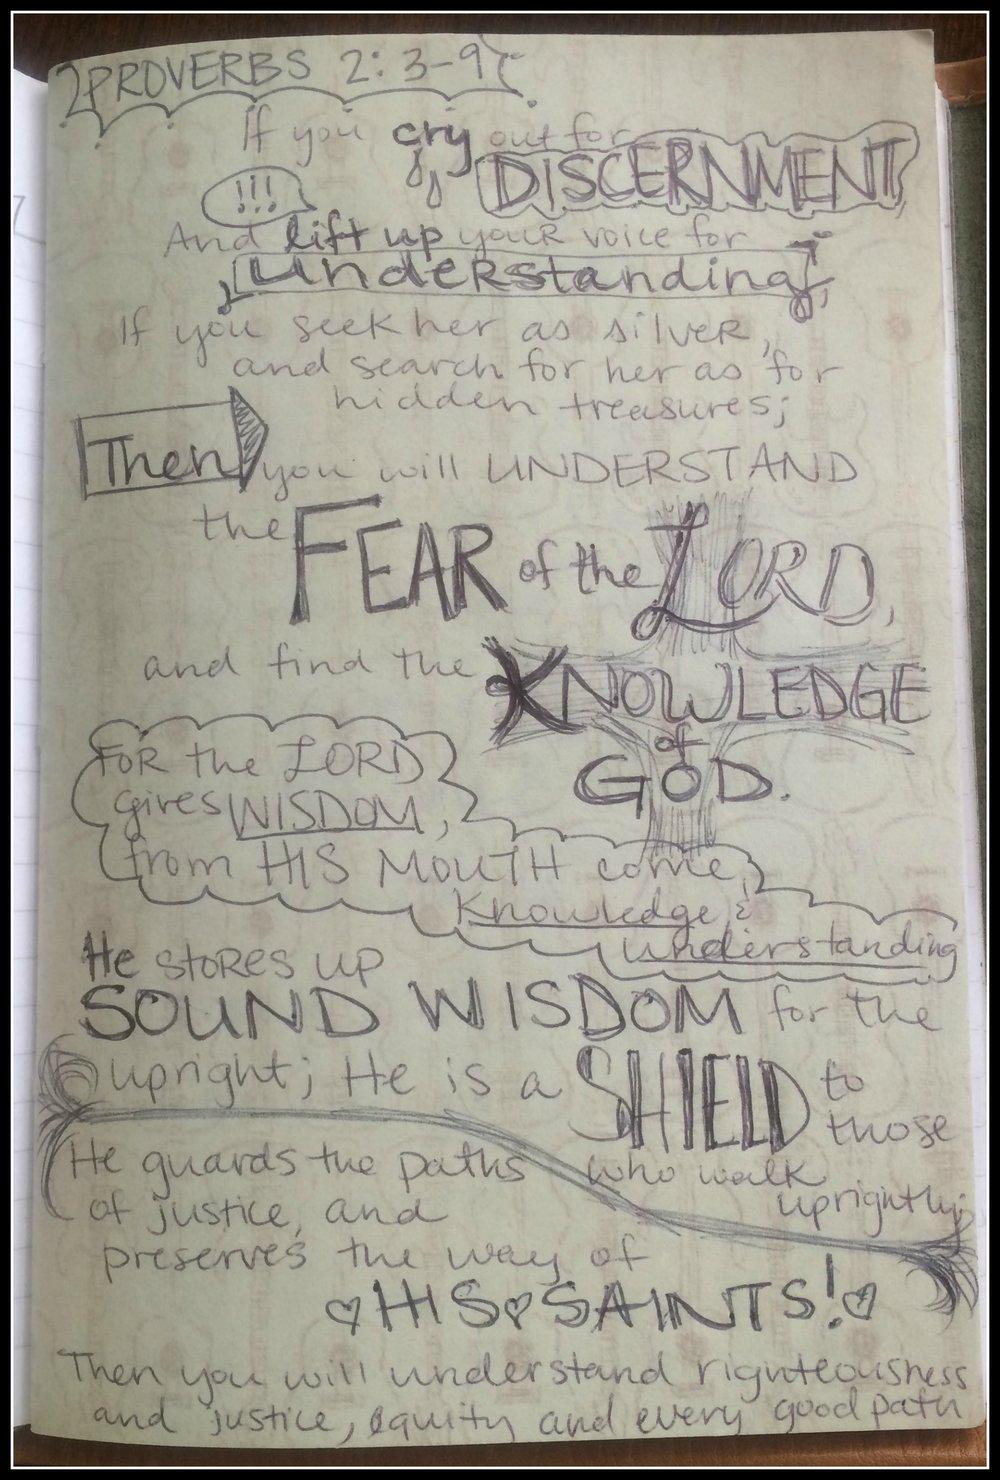 doodling verse